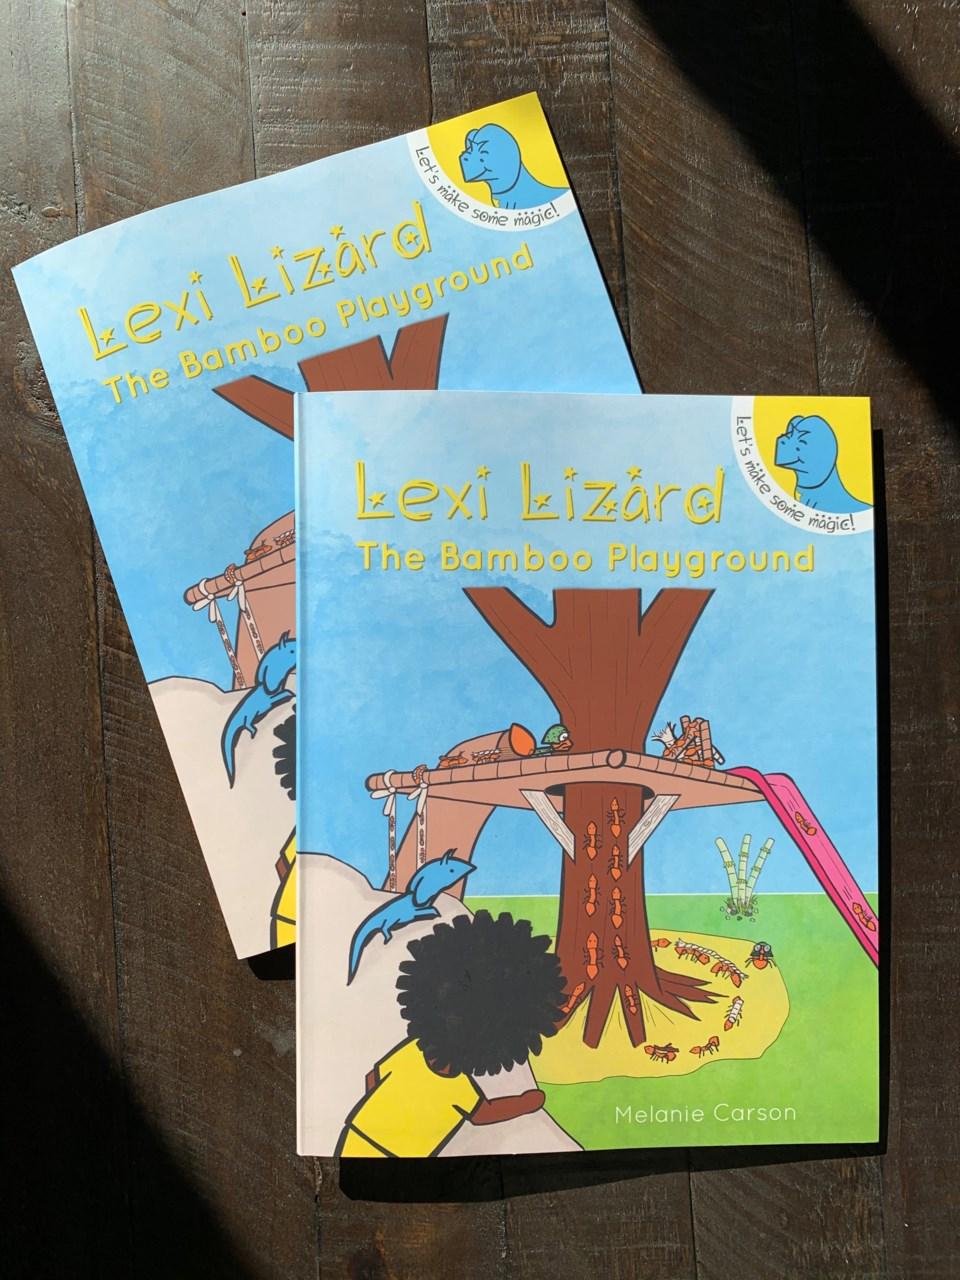 Lexi Lizard The Bamboo Playground